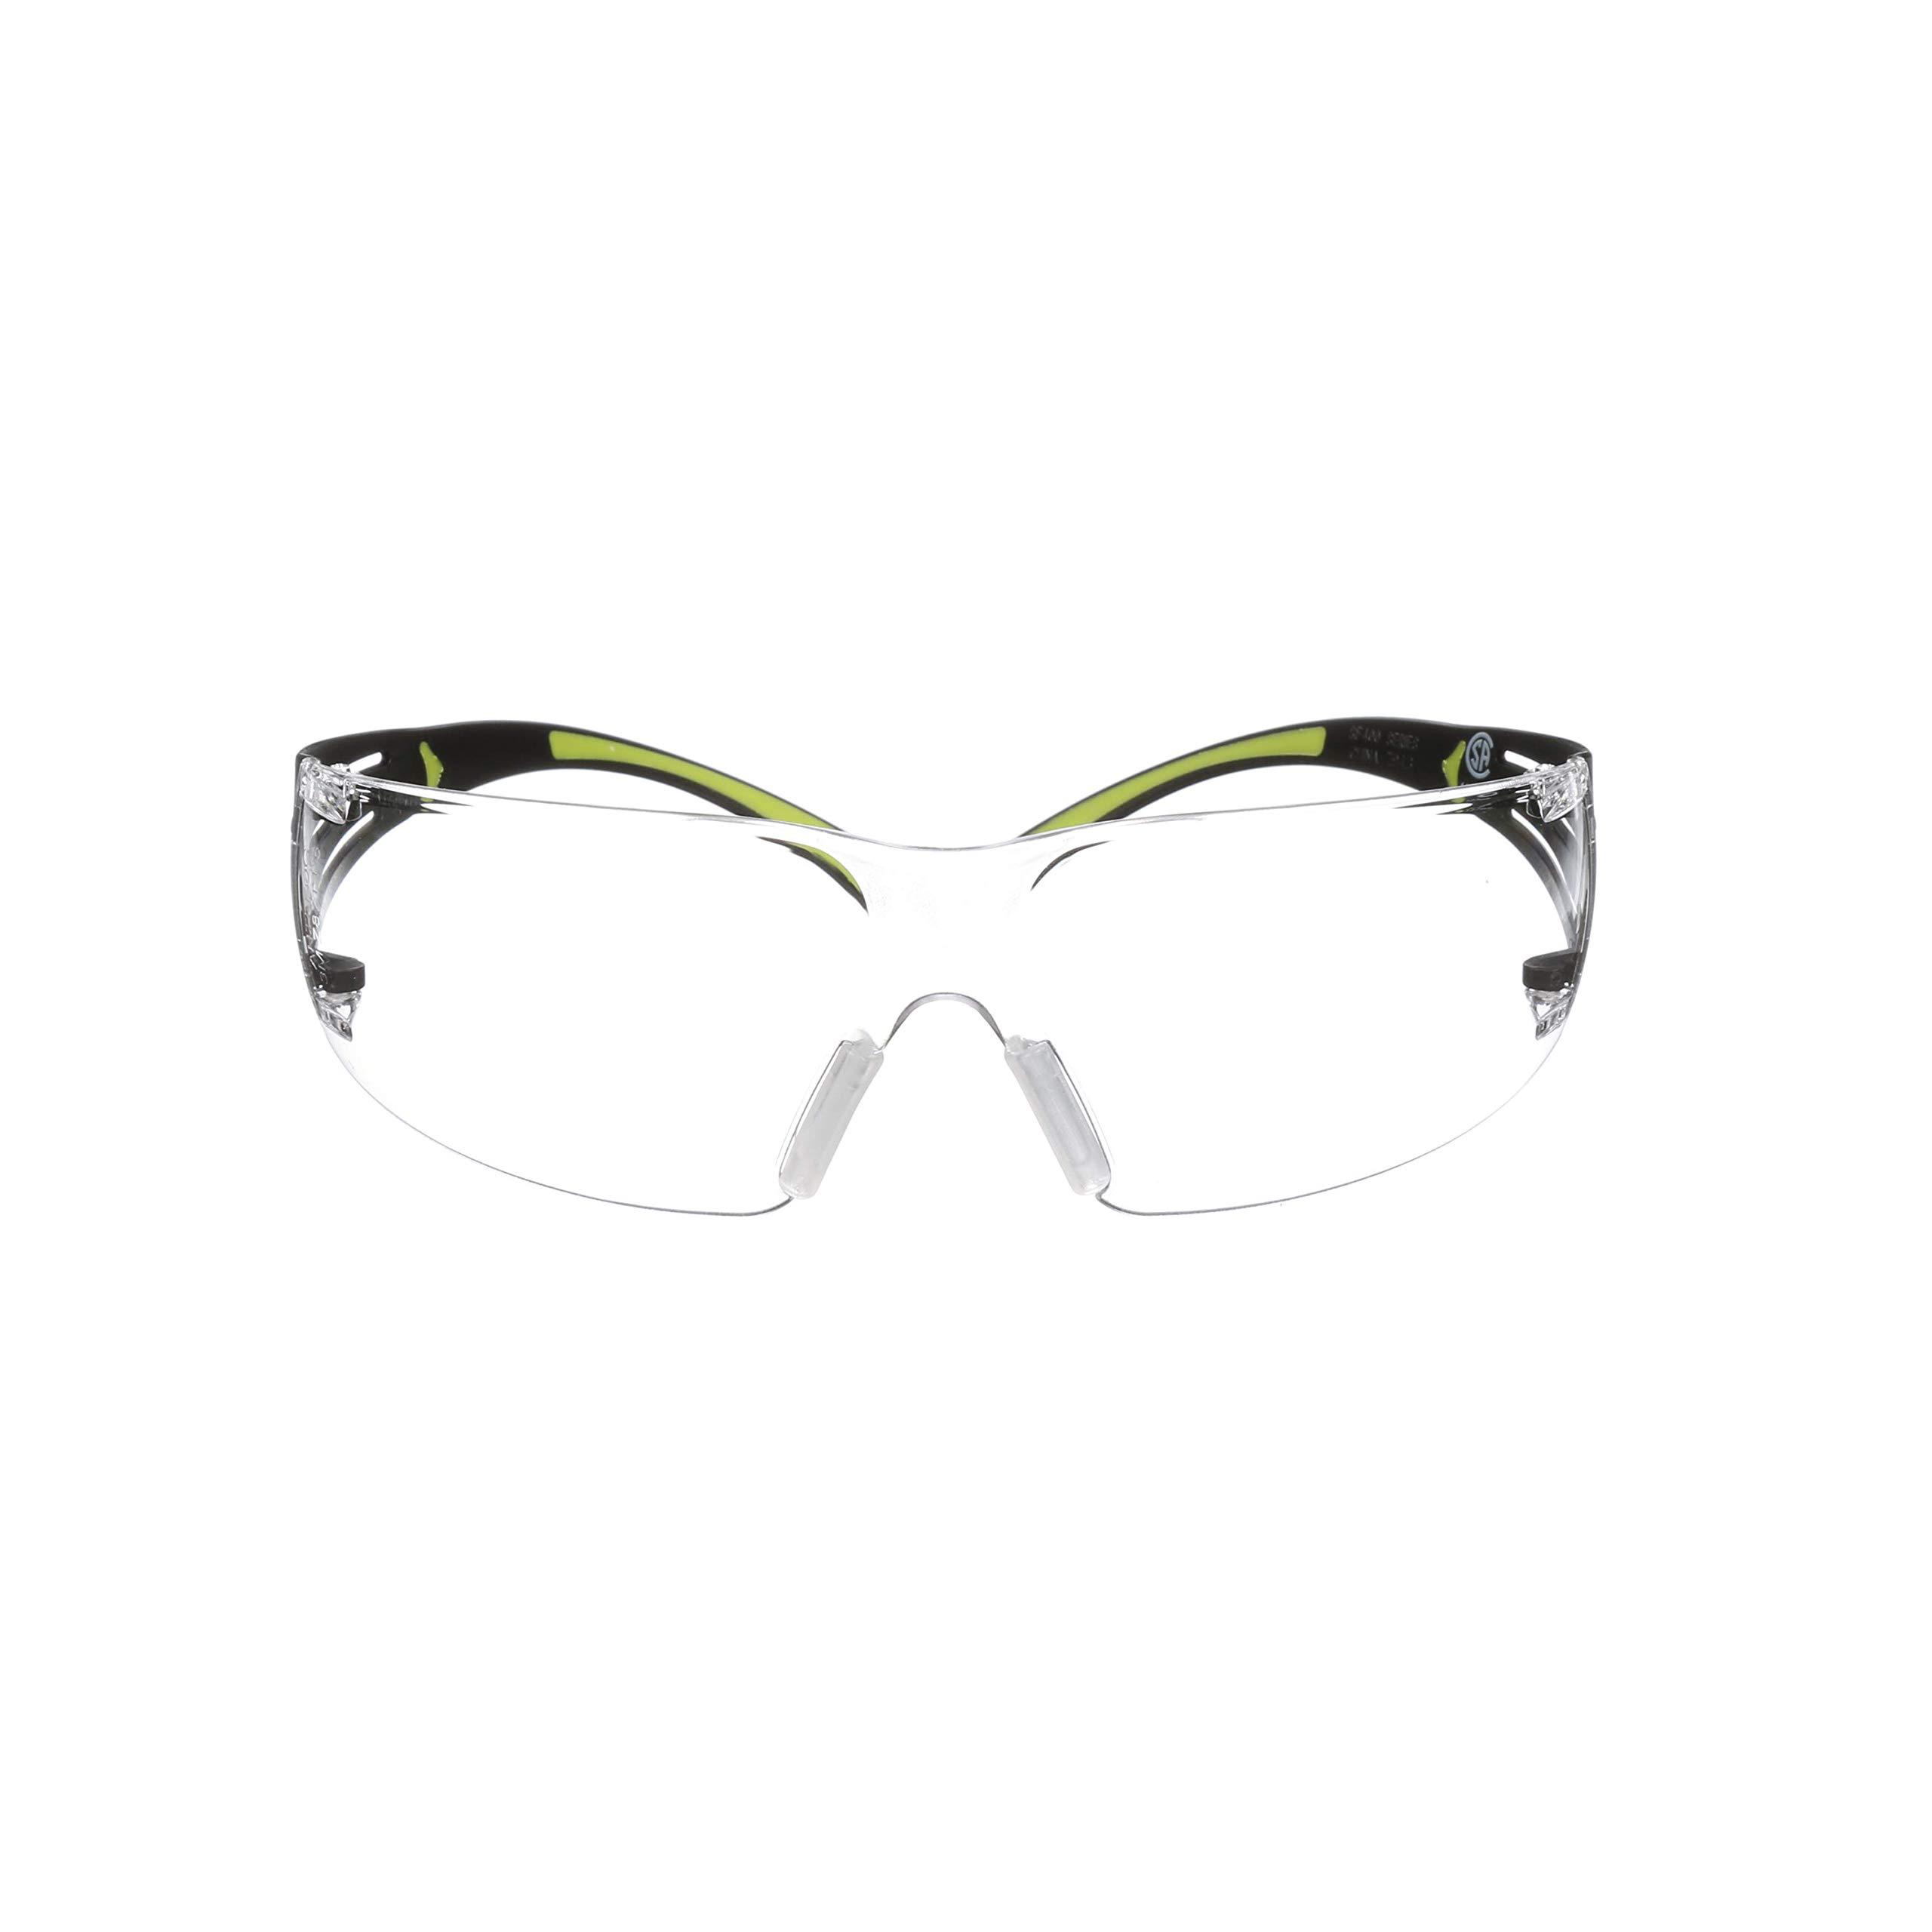 ce82e54185e4 3M SecureFit Protective Eyewear, 400-Series, SF401AF, CLEAR Anti-fog lens  (Case of 20): Amazon.com: Computers & Accessories